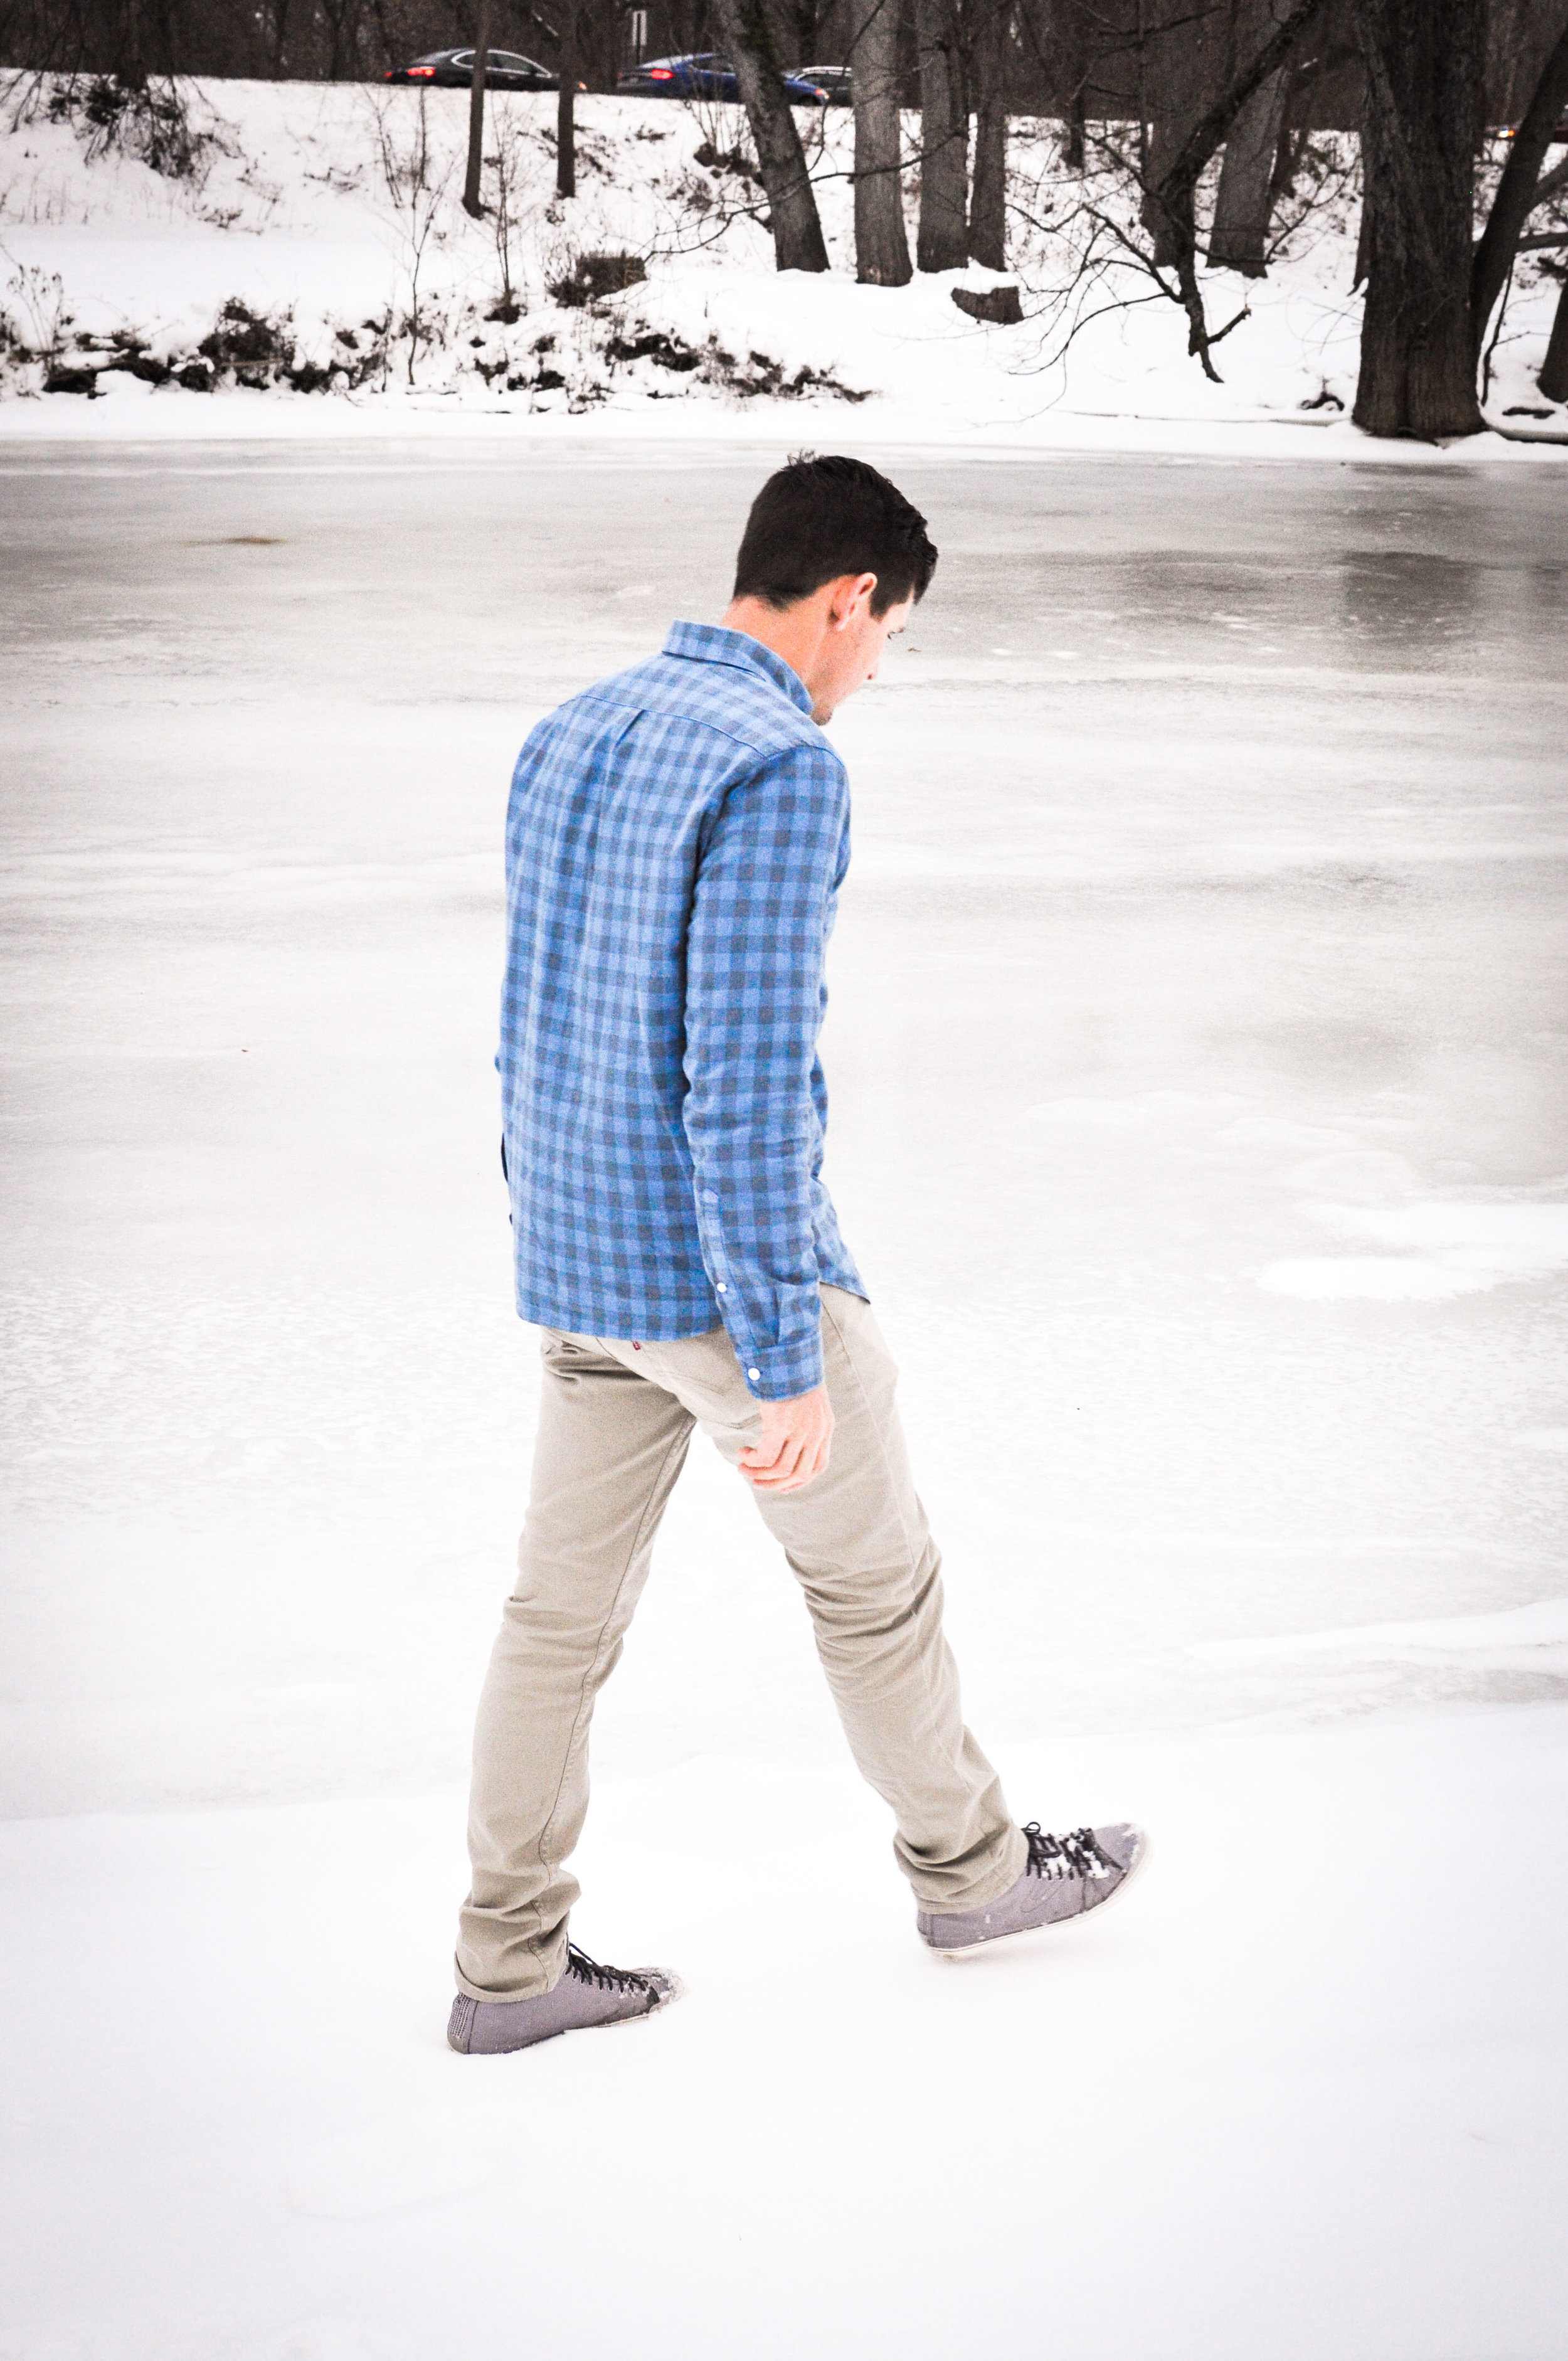 Man in blue shirt walking in snow